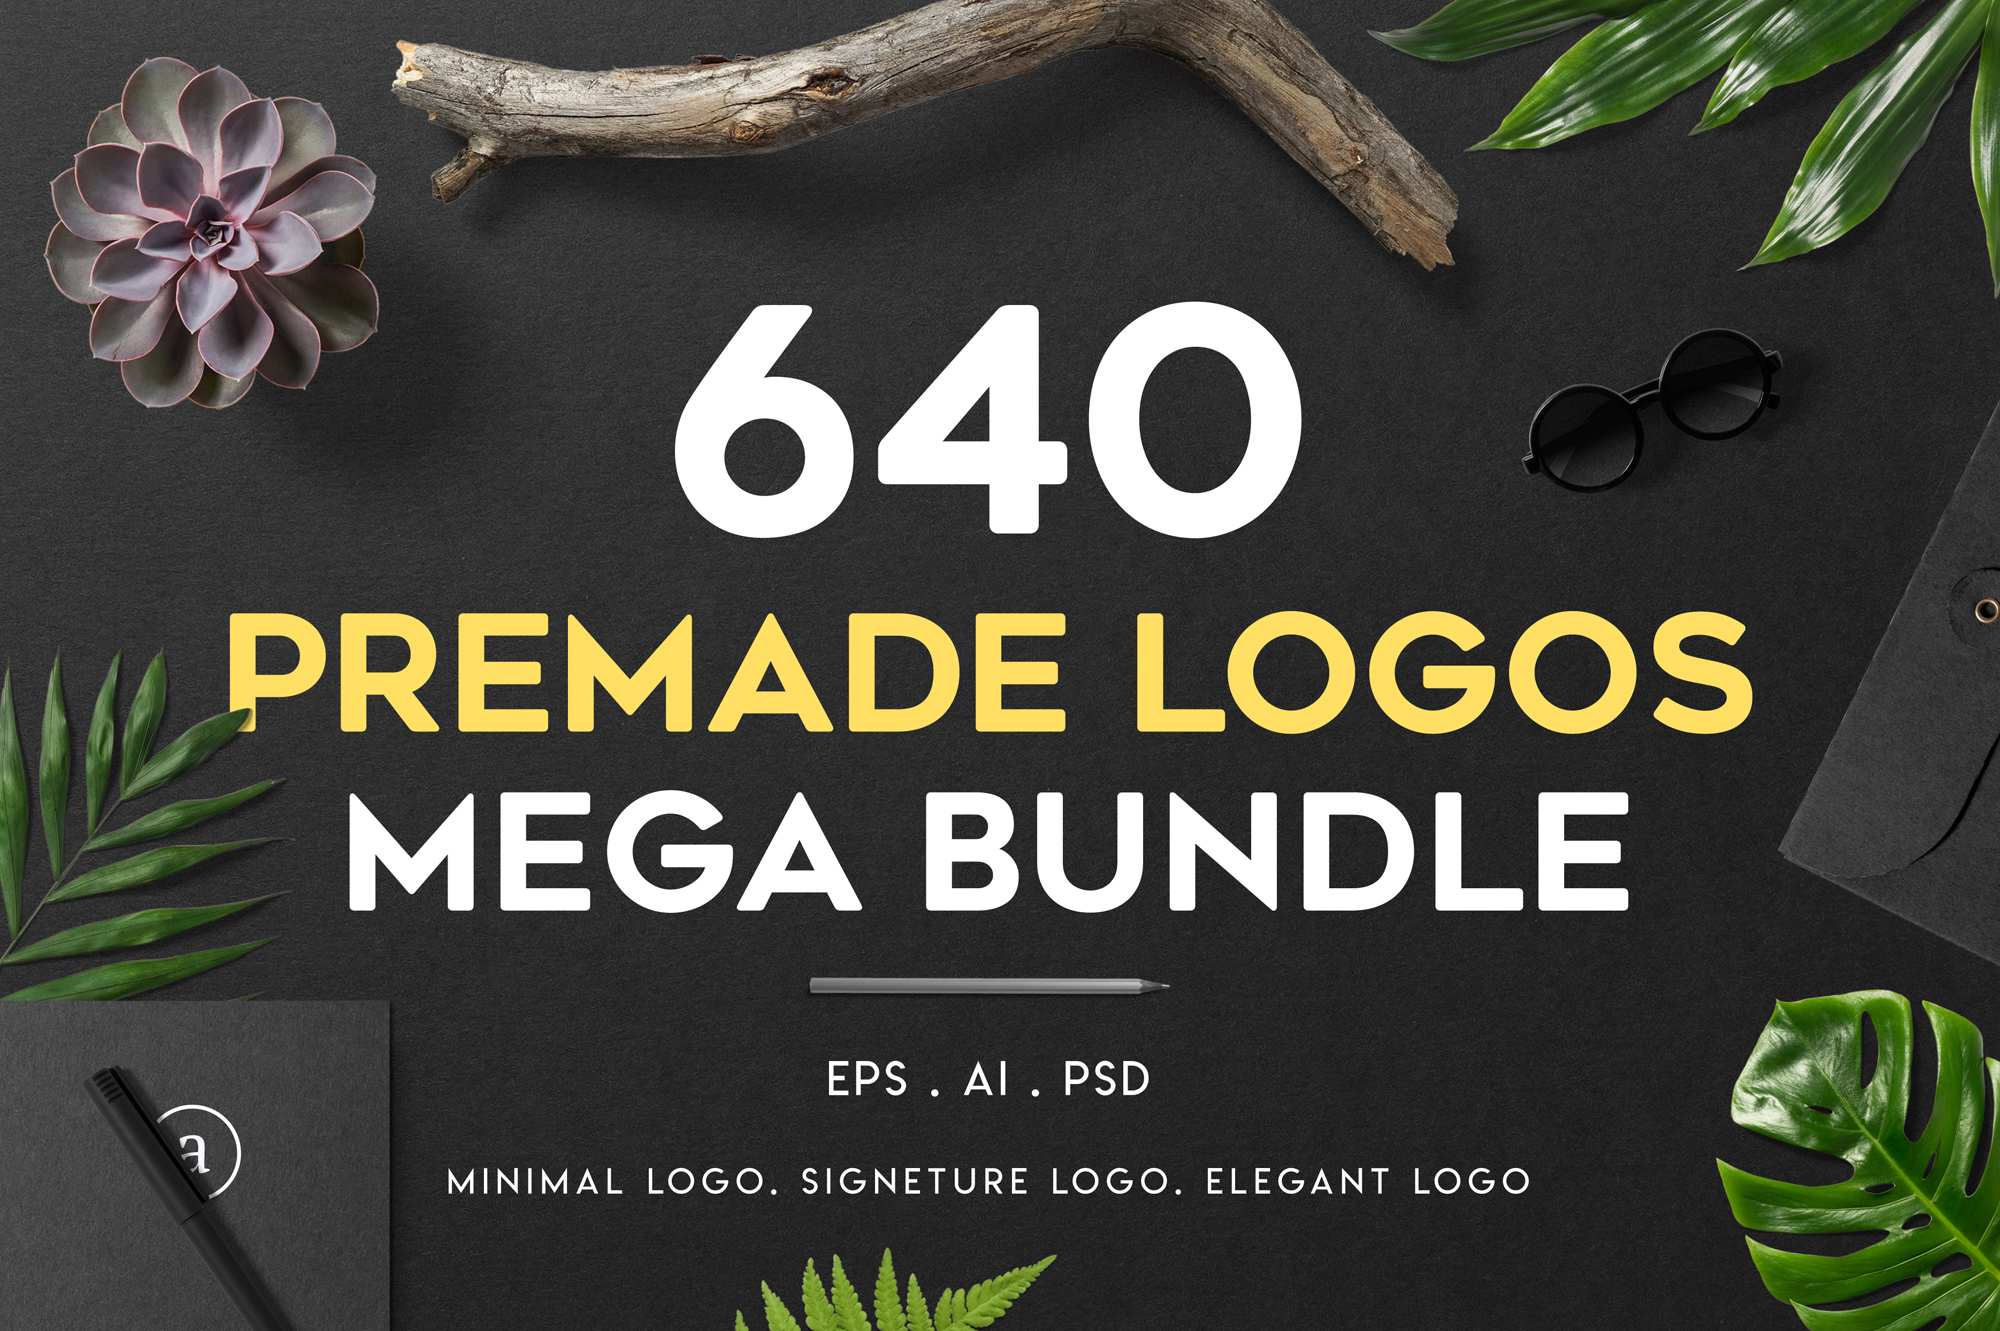 640 Premade Logos Mega Bundle example image 1